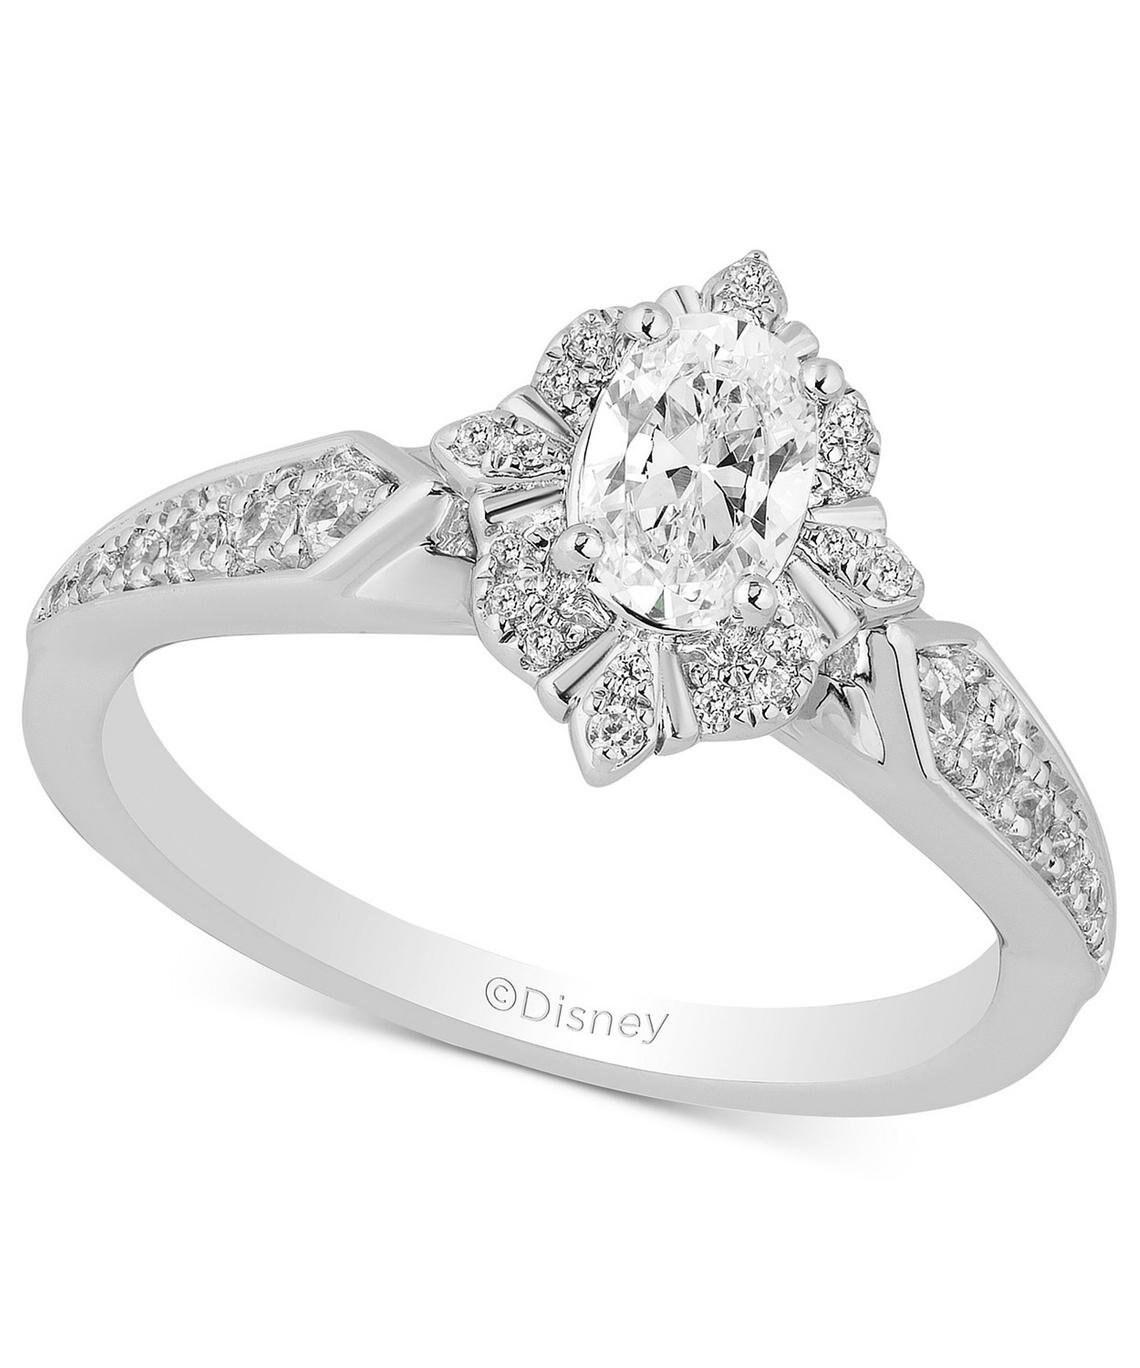 Enchanted Disney Villains Evil Queen 1.35 CT Round Cut Diamond Engagement Ring